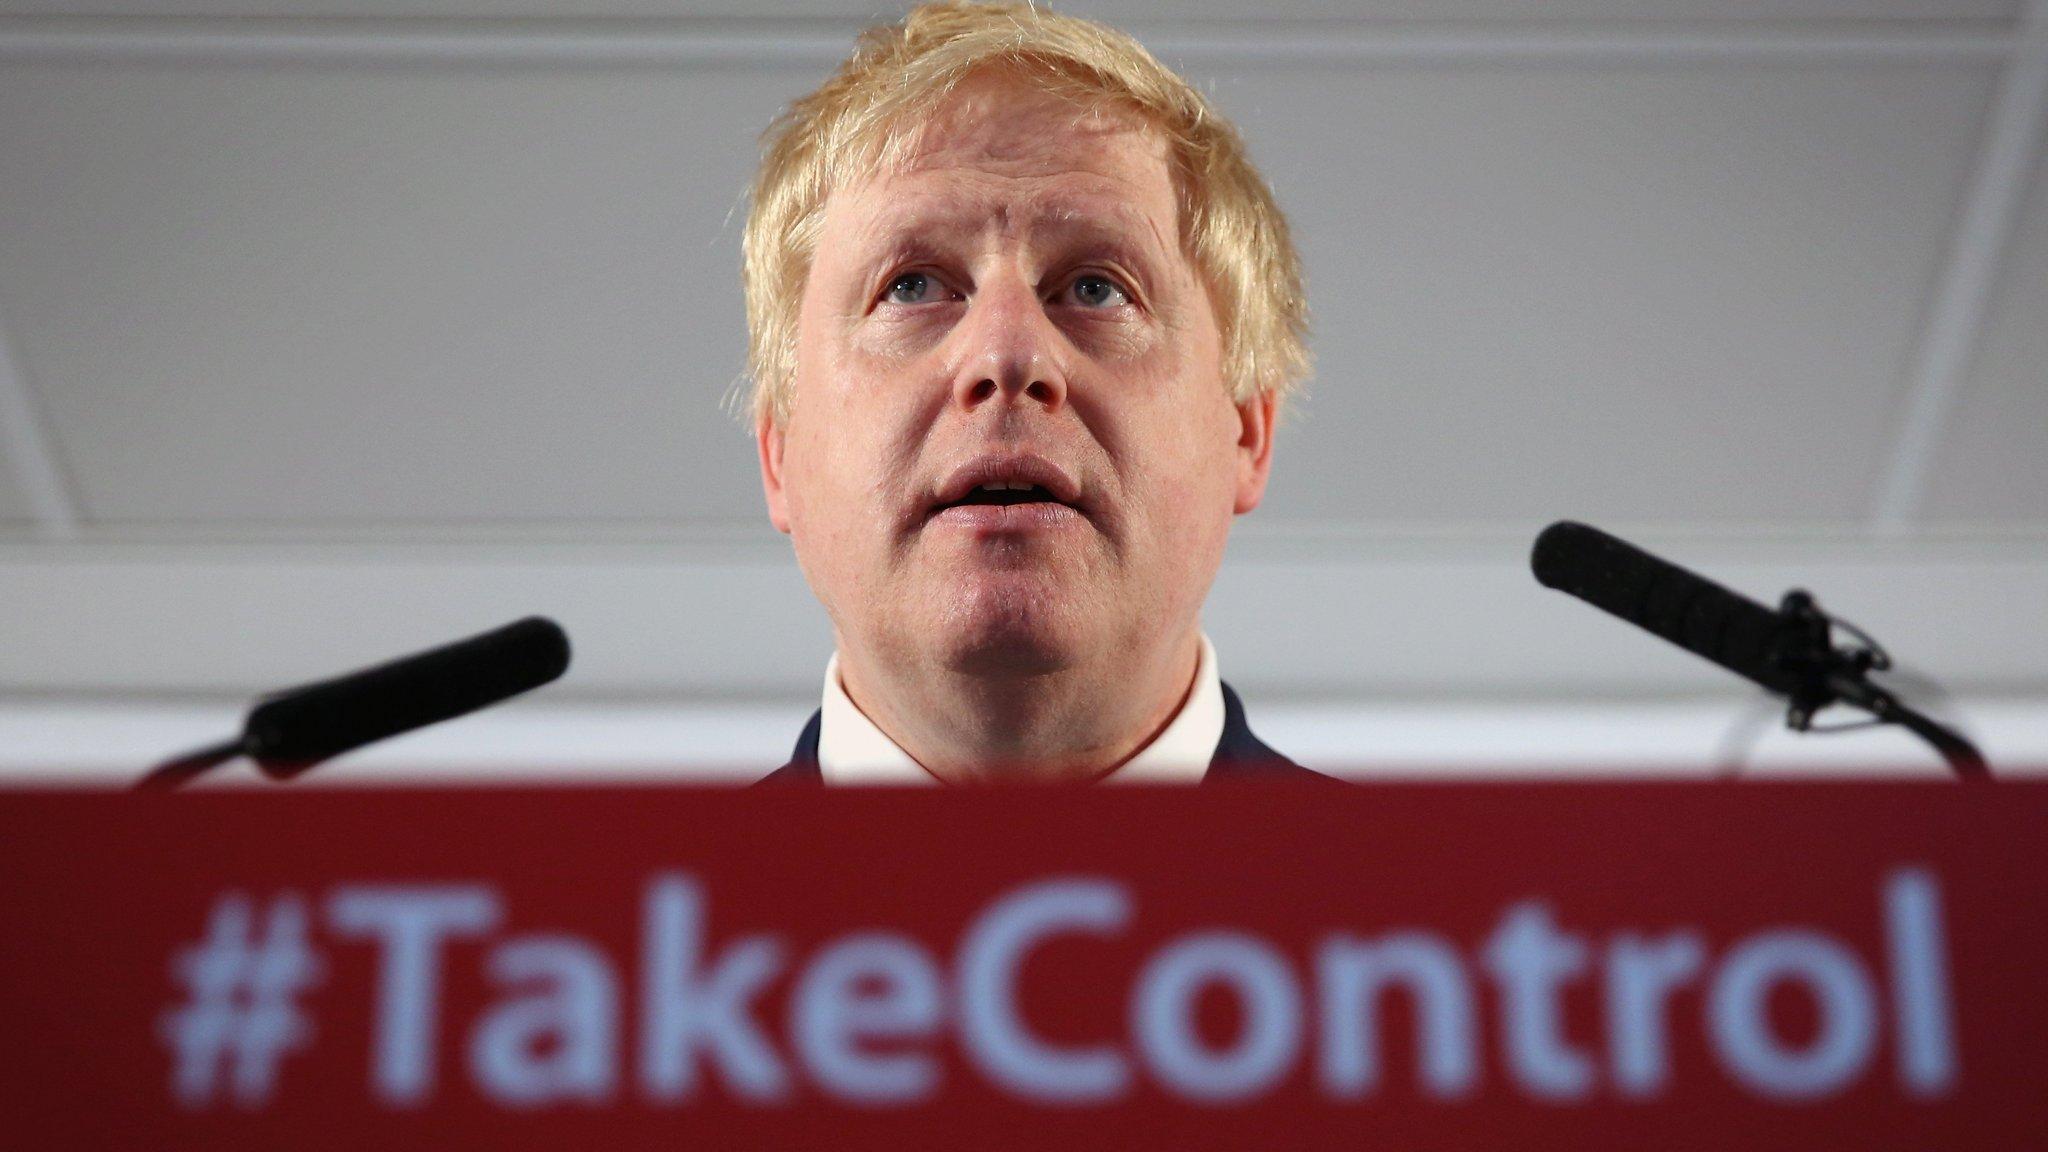 MPs demand Boris Johnson recall parliament to assess Brexit options